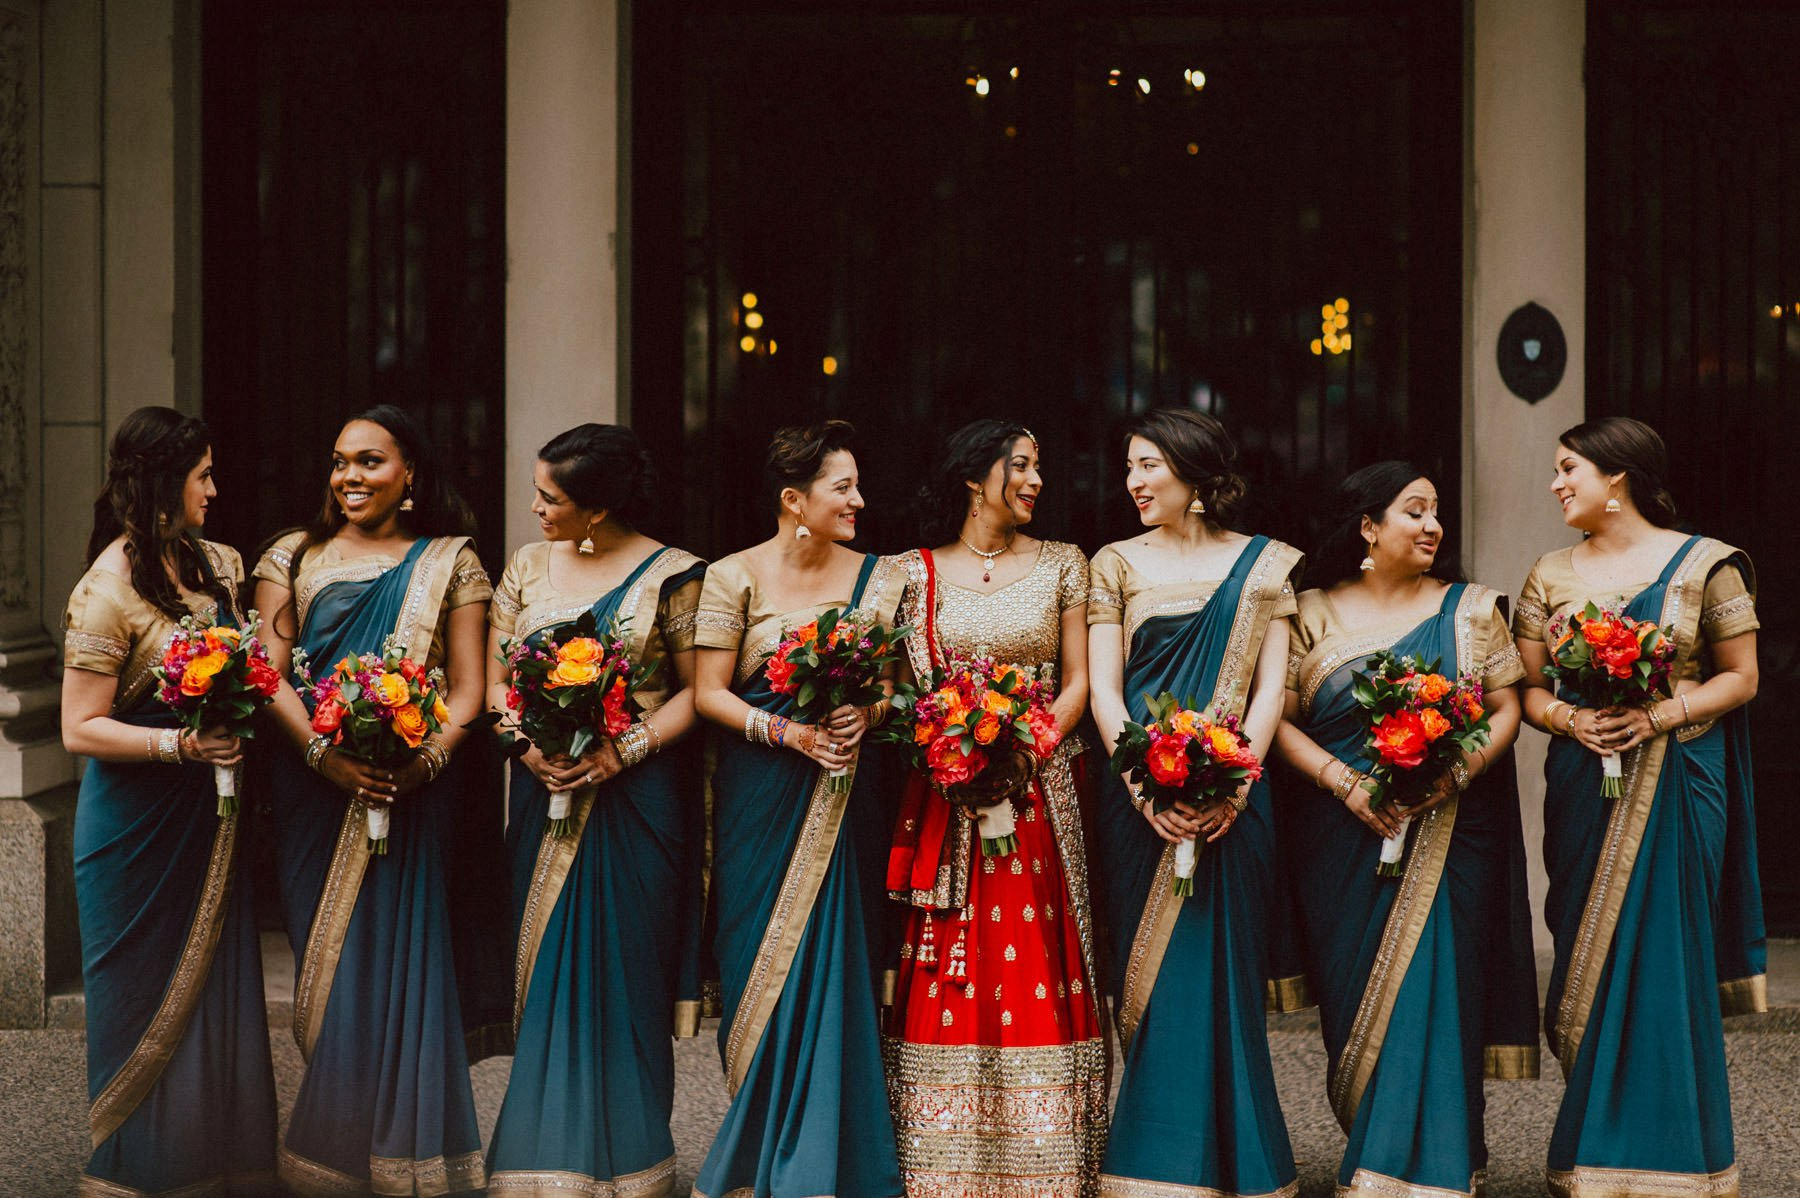 vie-philadelphia-indian-wedding-39.jpg